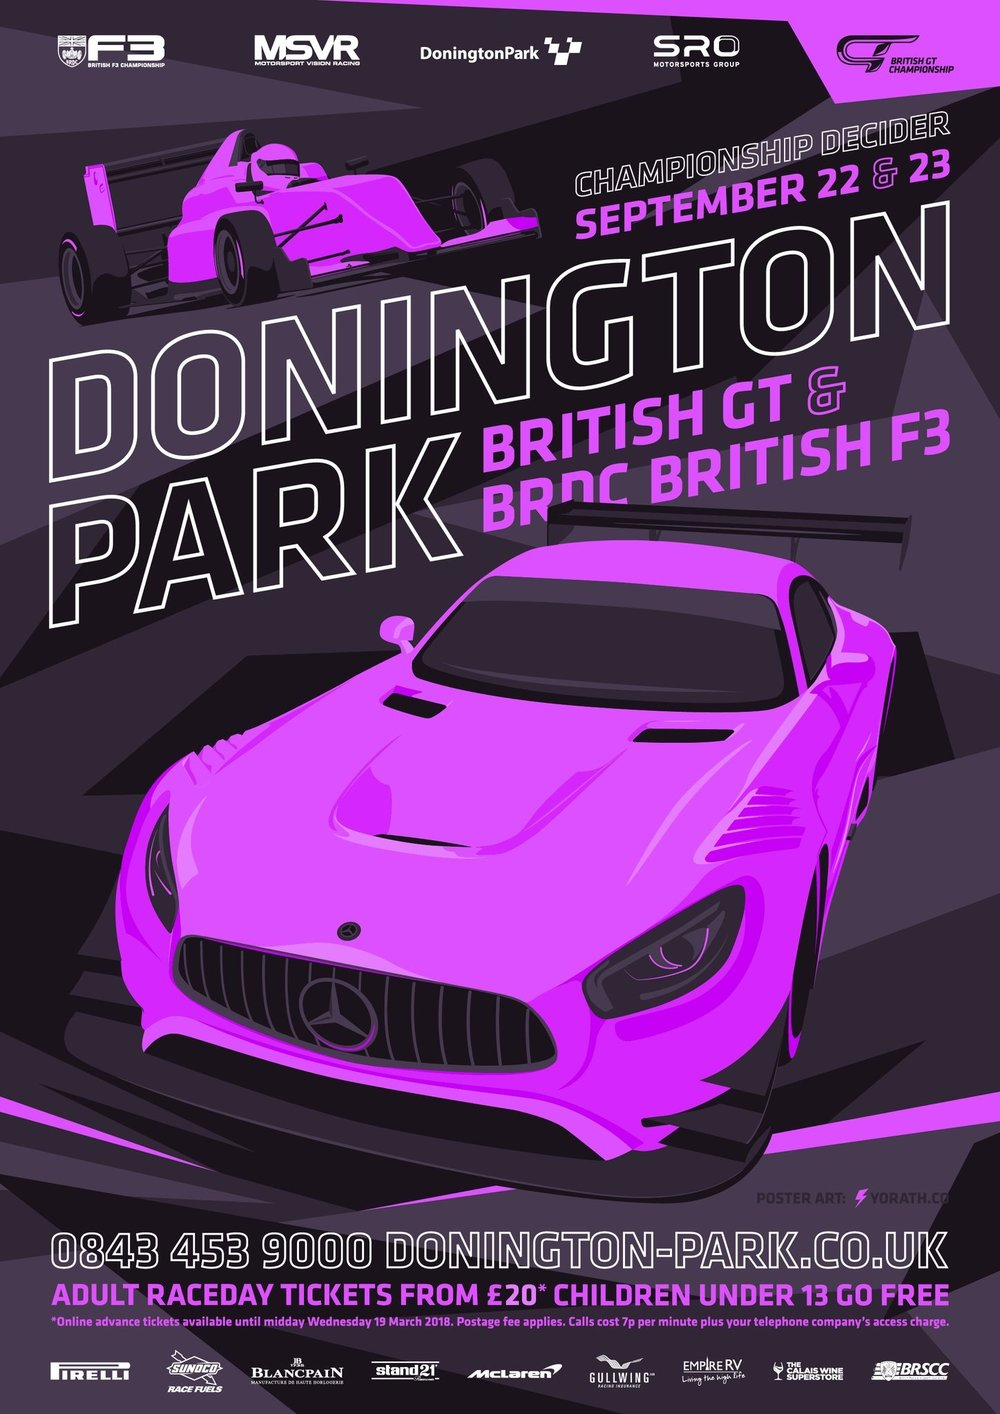 british-gt-banner-image-donington.JPG